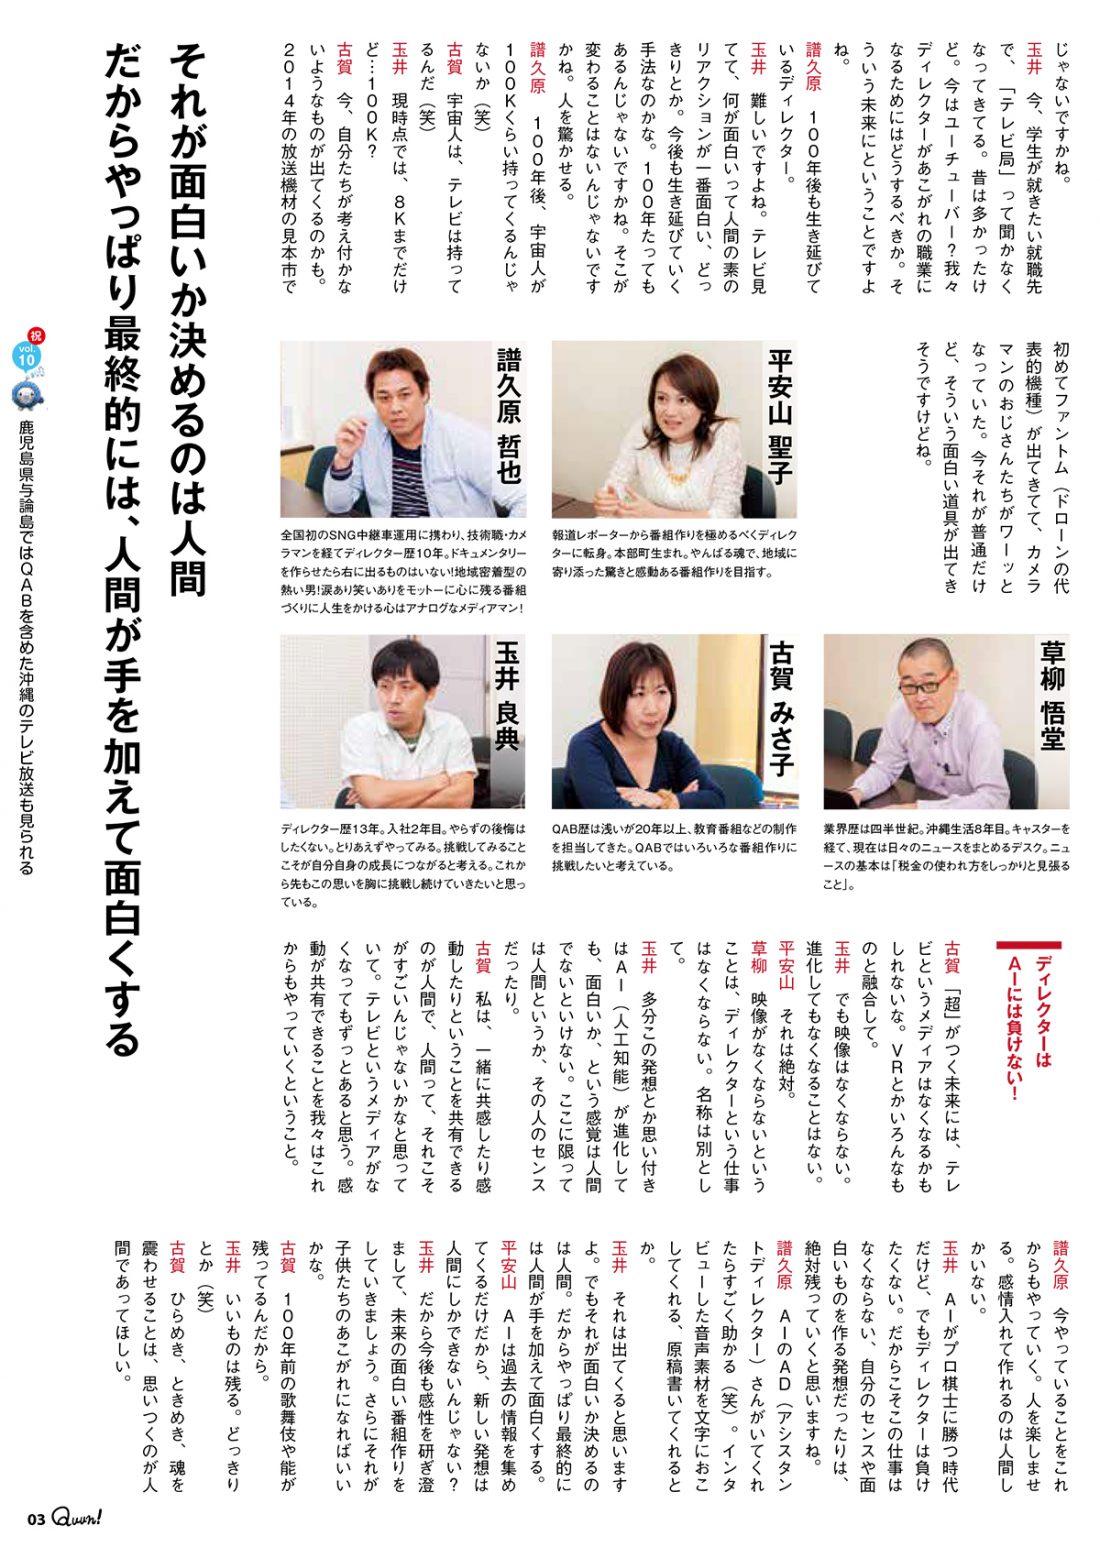 http://www.qab.co.jp/qgoro/wp-content/uploads/quun_1005-1100x1558.jpg